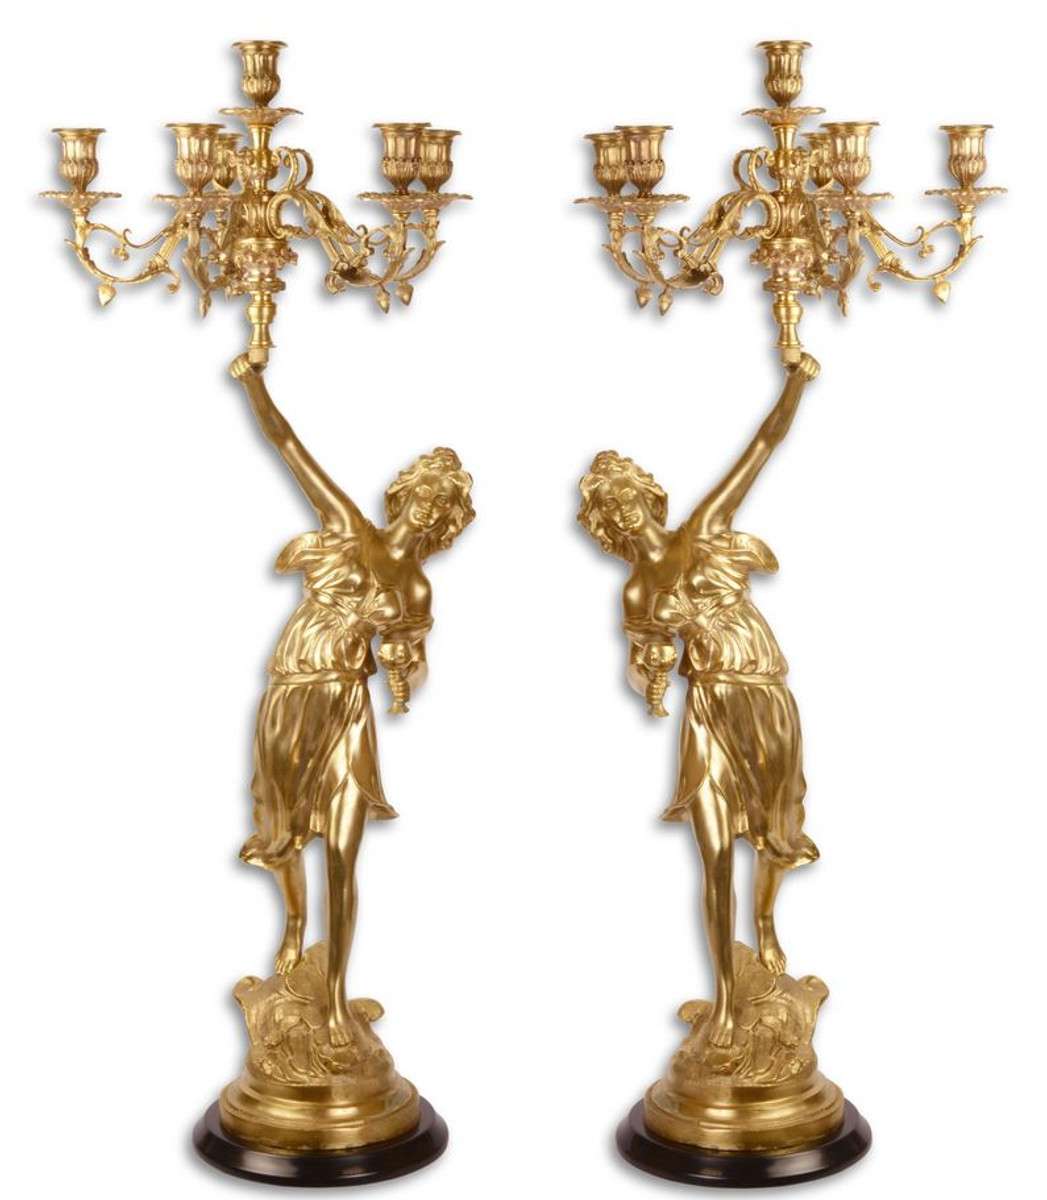 Casa Padrino Barock Kerzenständer Set Gold 32,5 x 32,5 x H. 87 cm - Hotel & Restaurant Deko 1